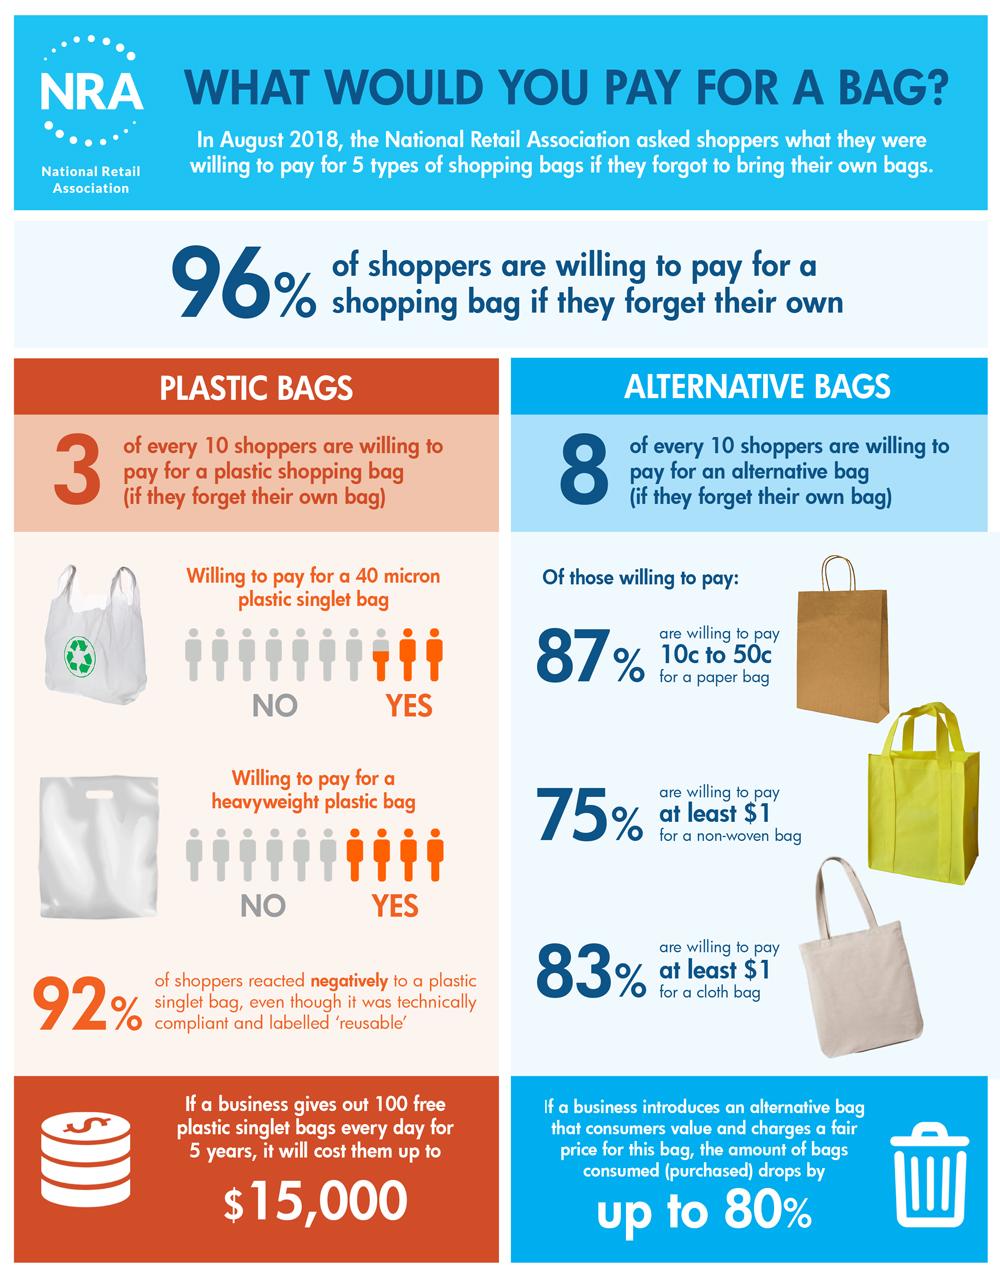 NRA-bag-perceptions-survey-infographic